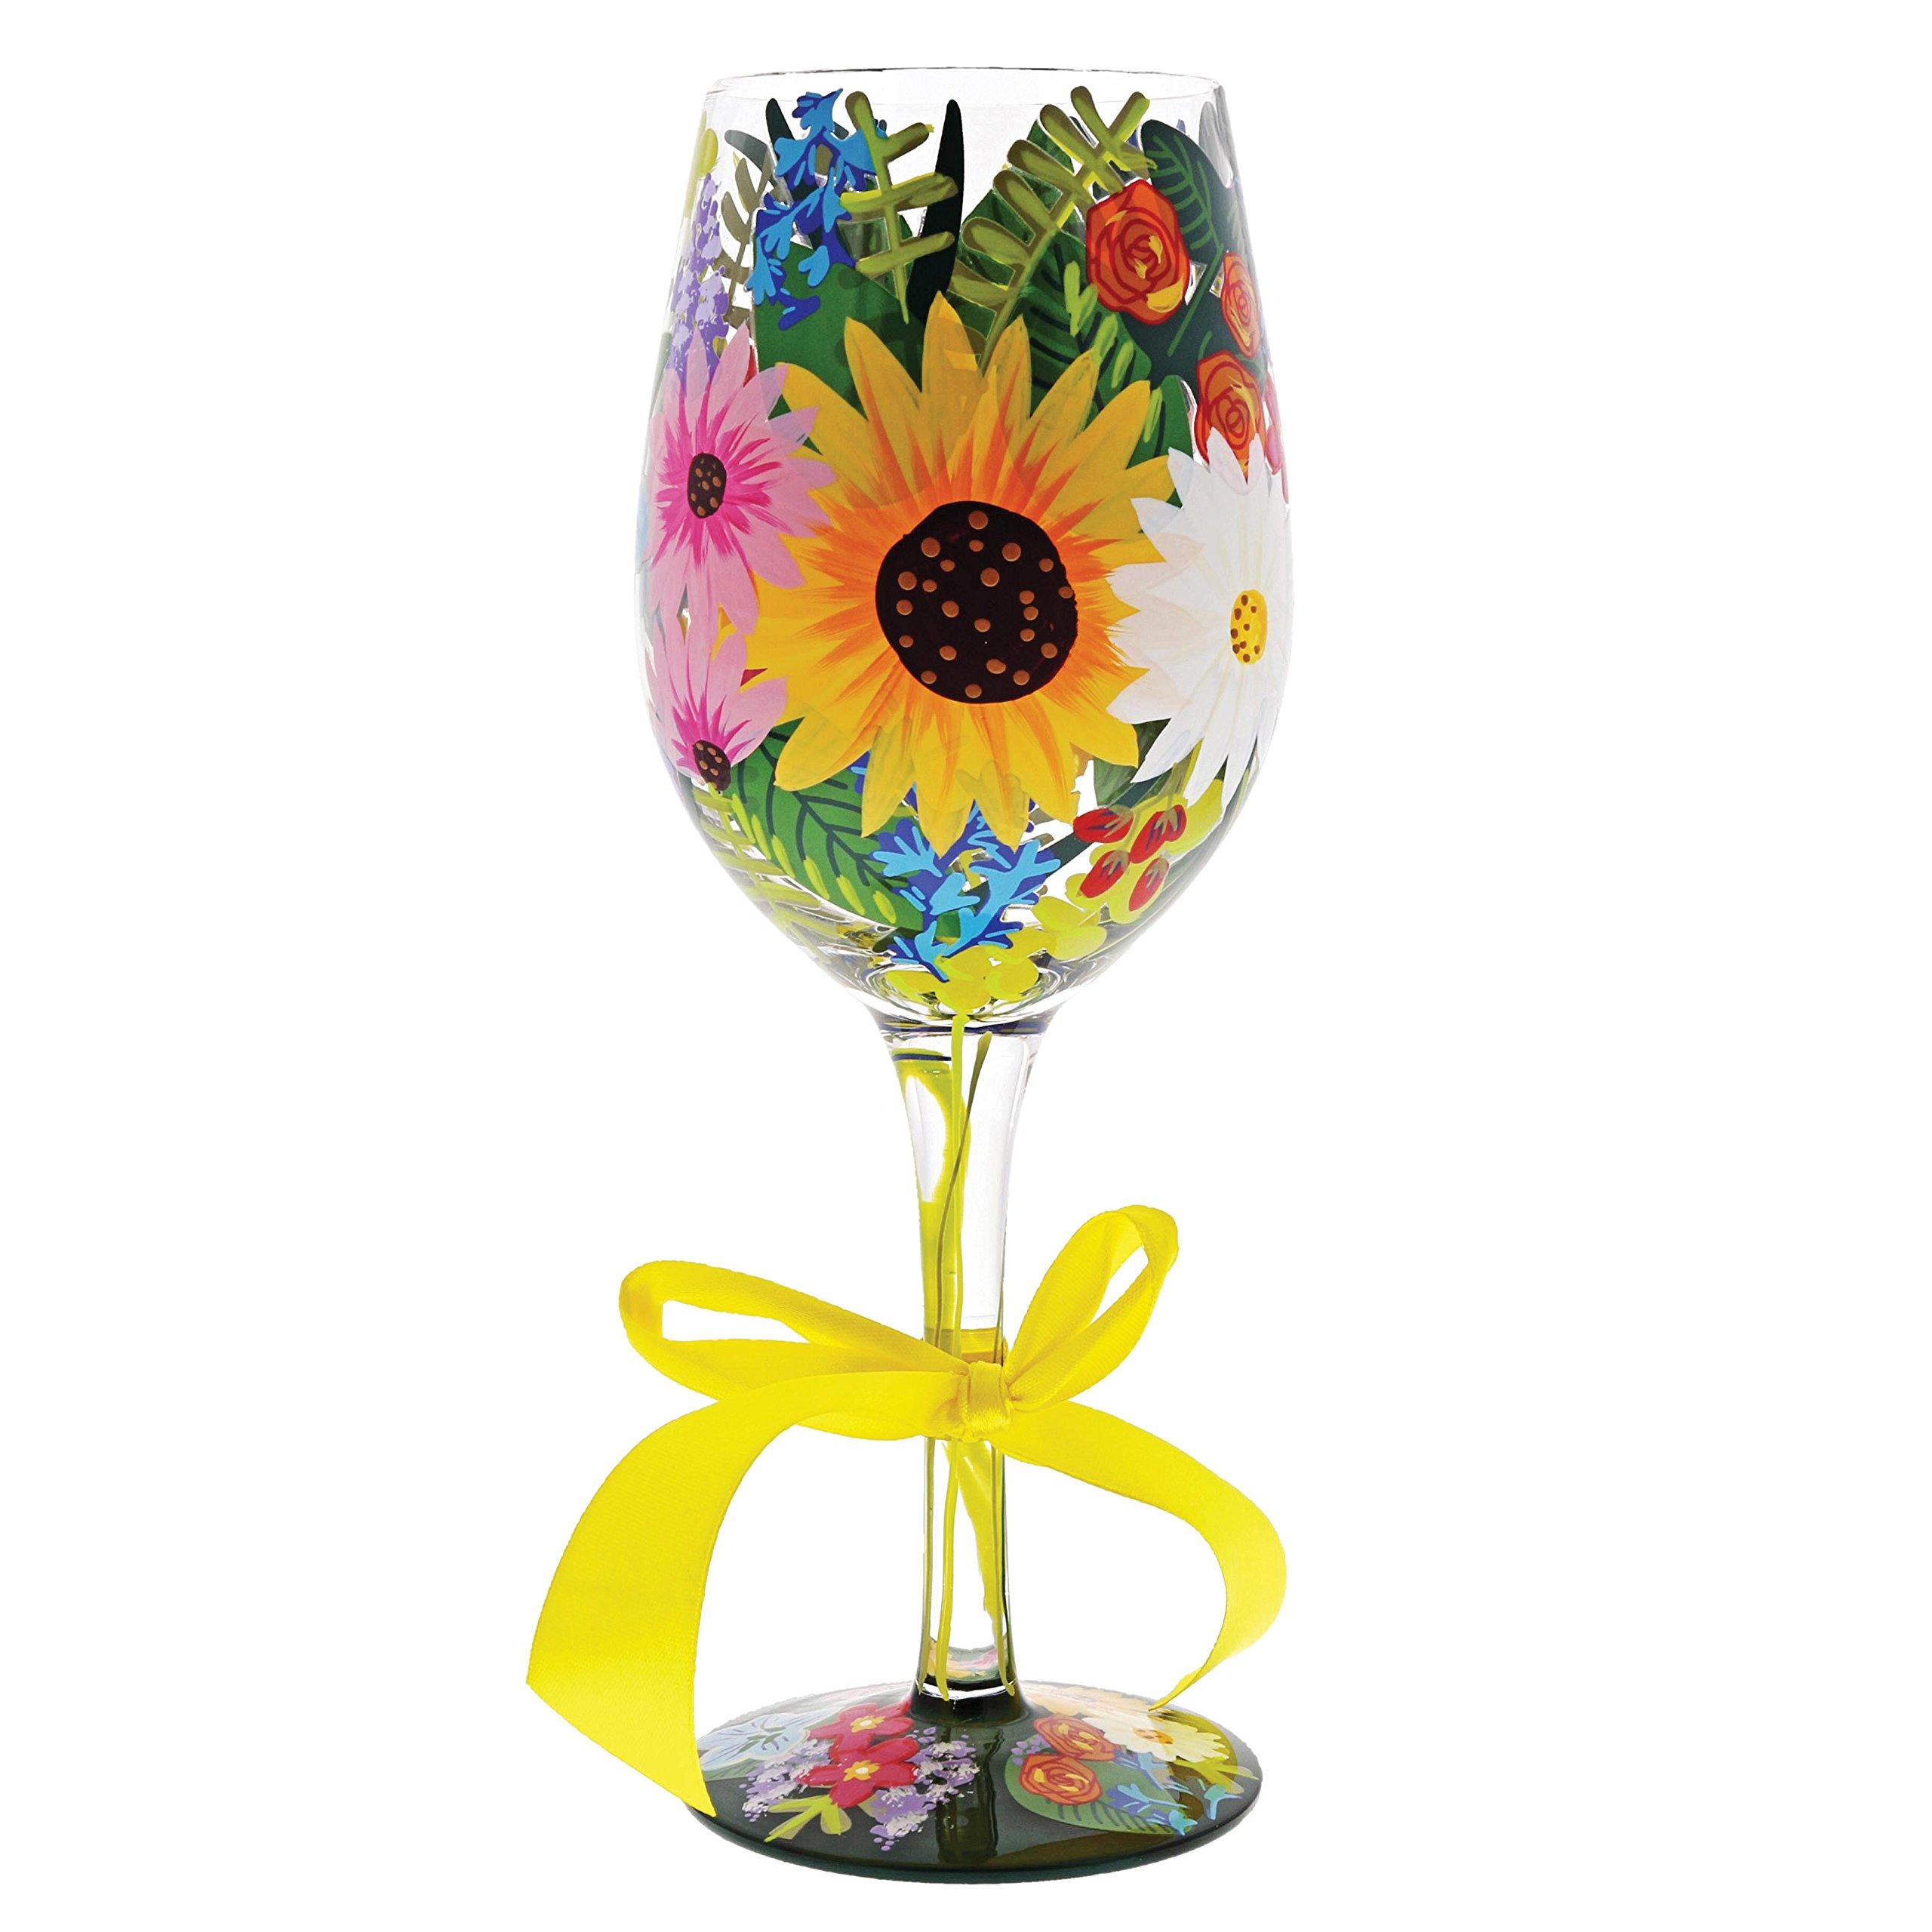 "Designs by Lolita ""Wildflowers"" Hand-painted Artisan Wine Glass, 15 oz."